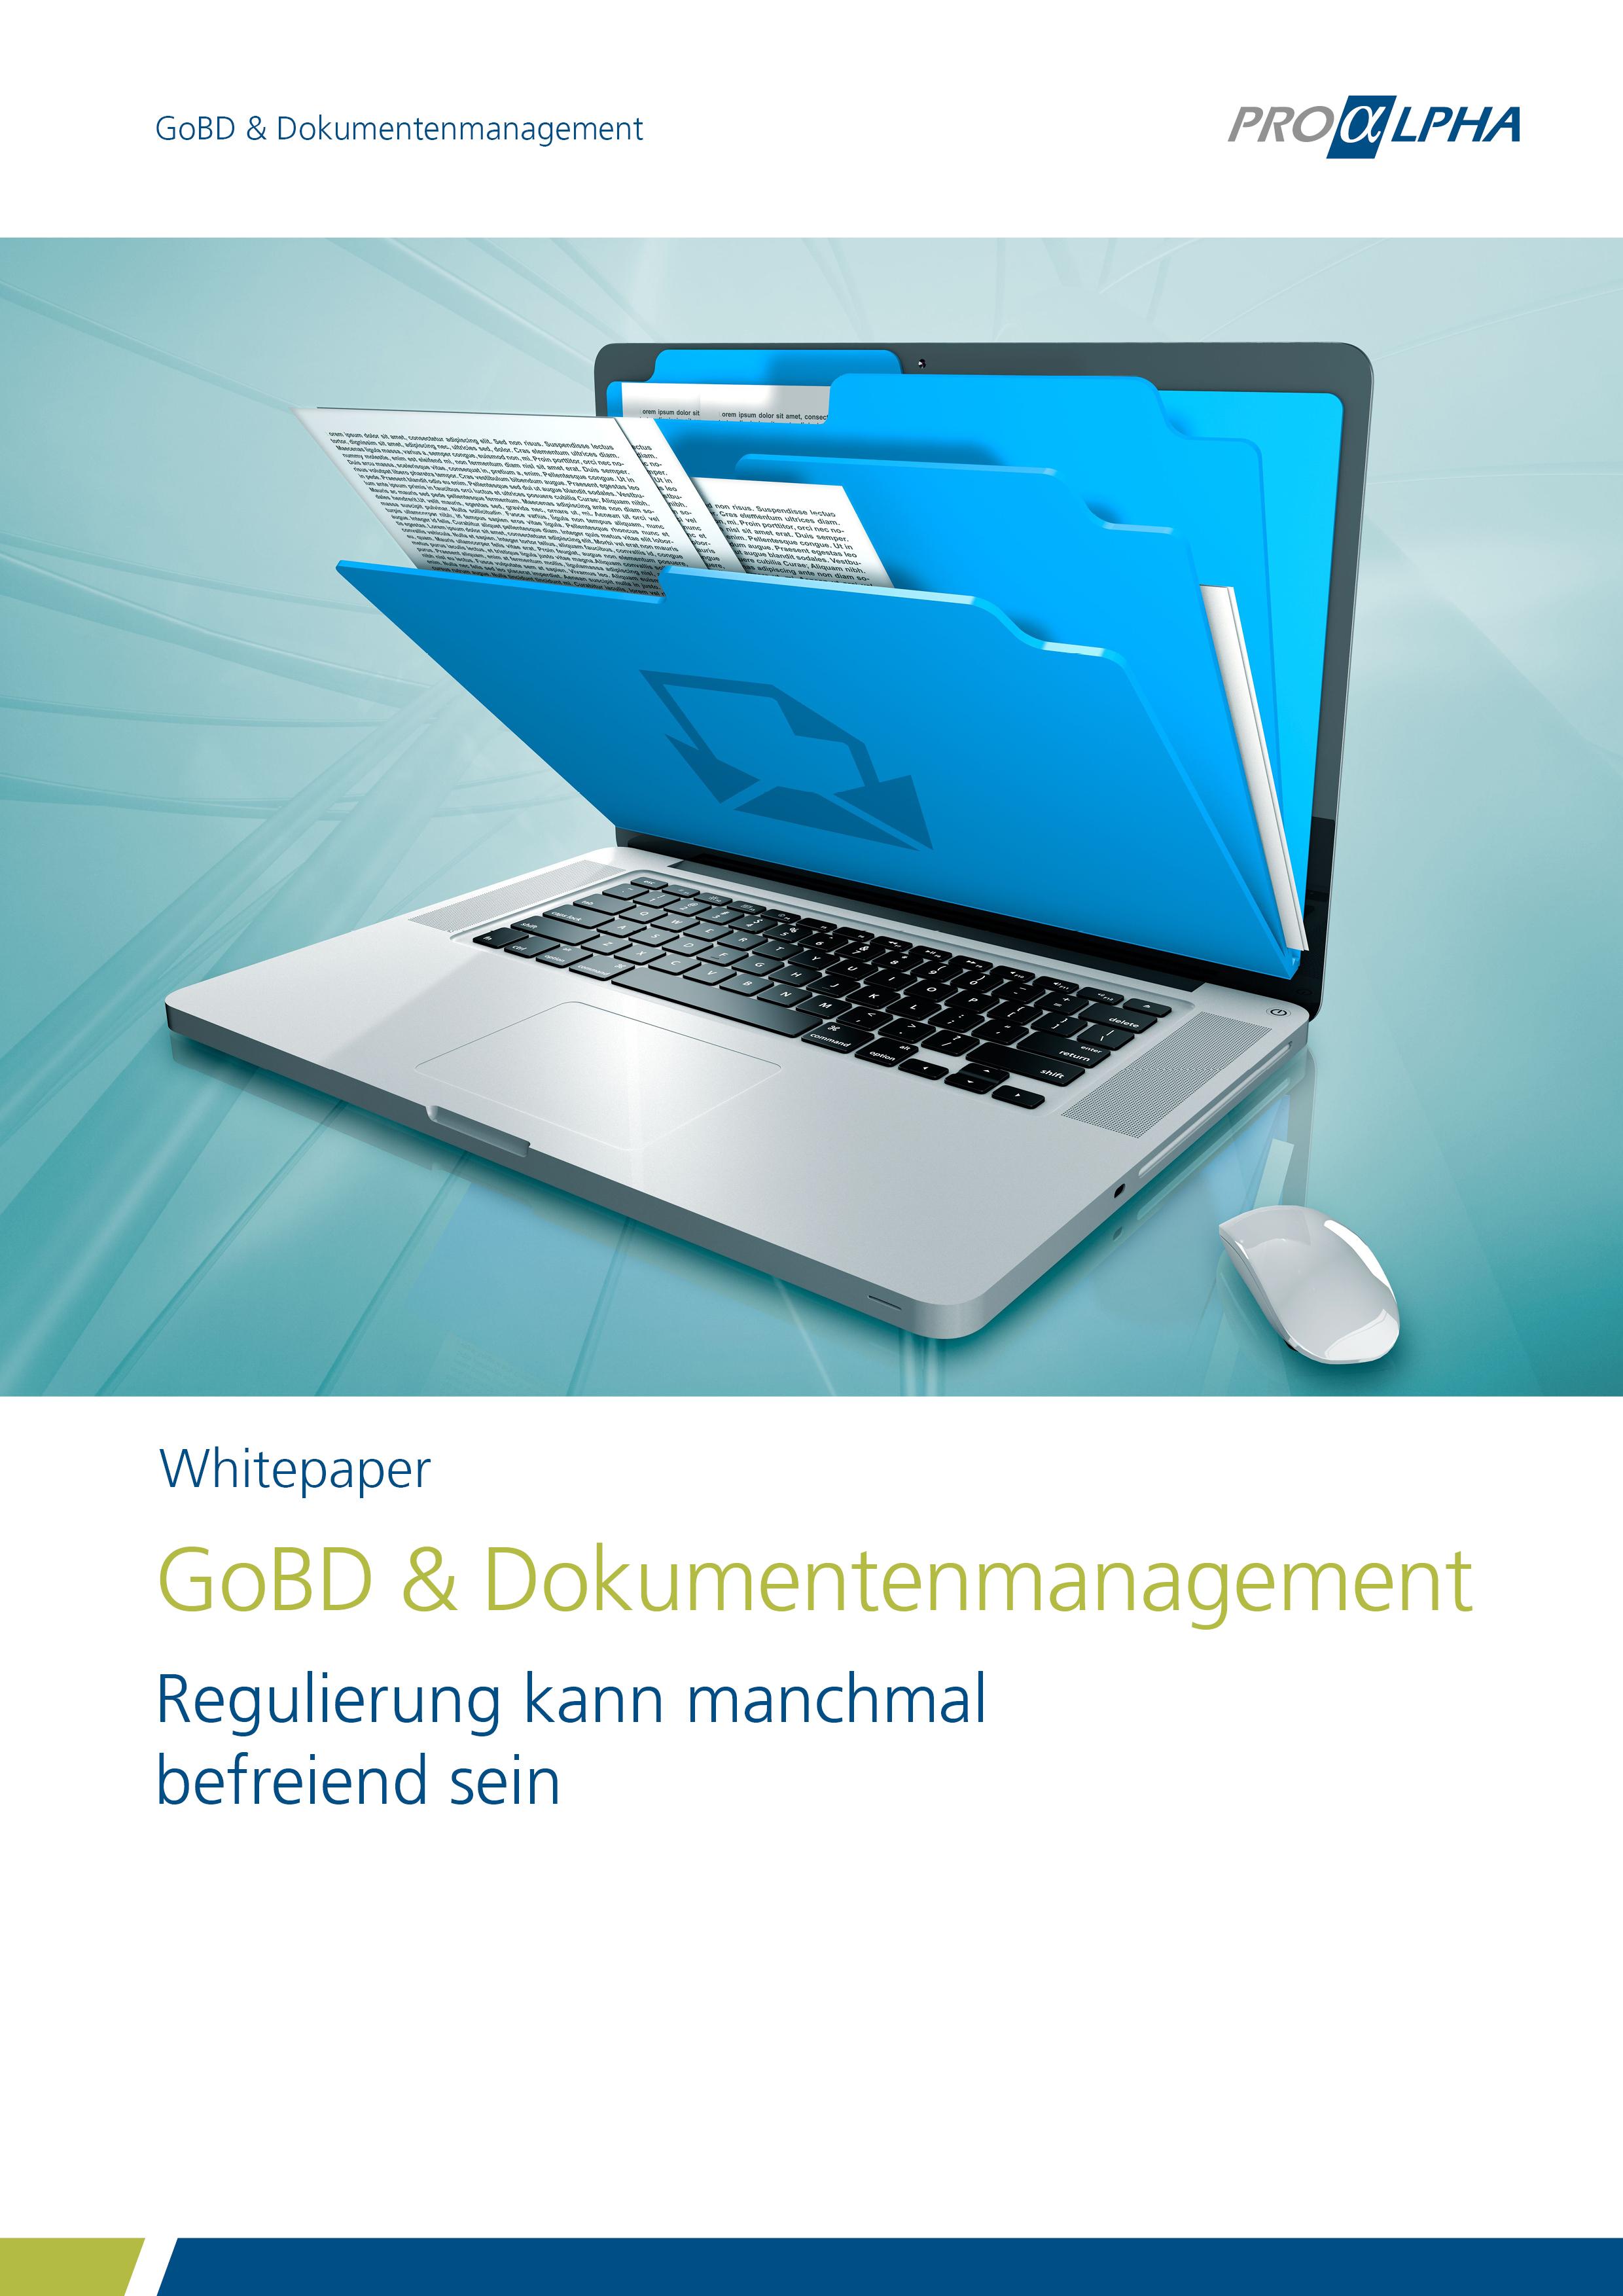 GoBD_&_Dokumentenmanagement_cover